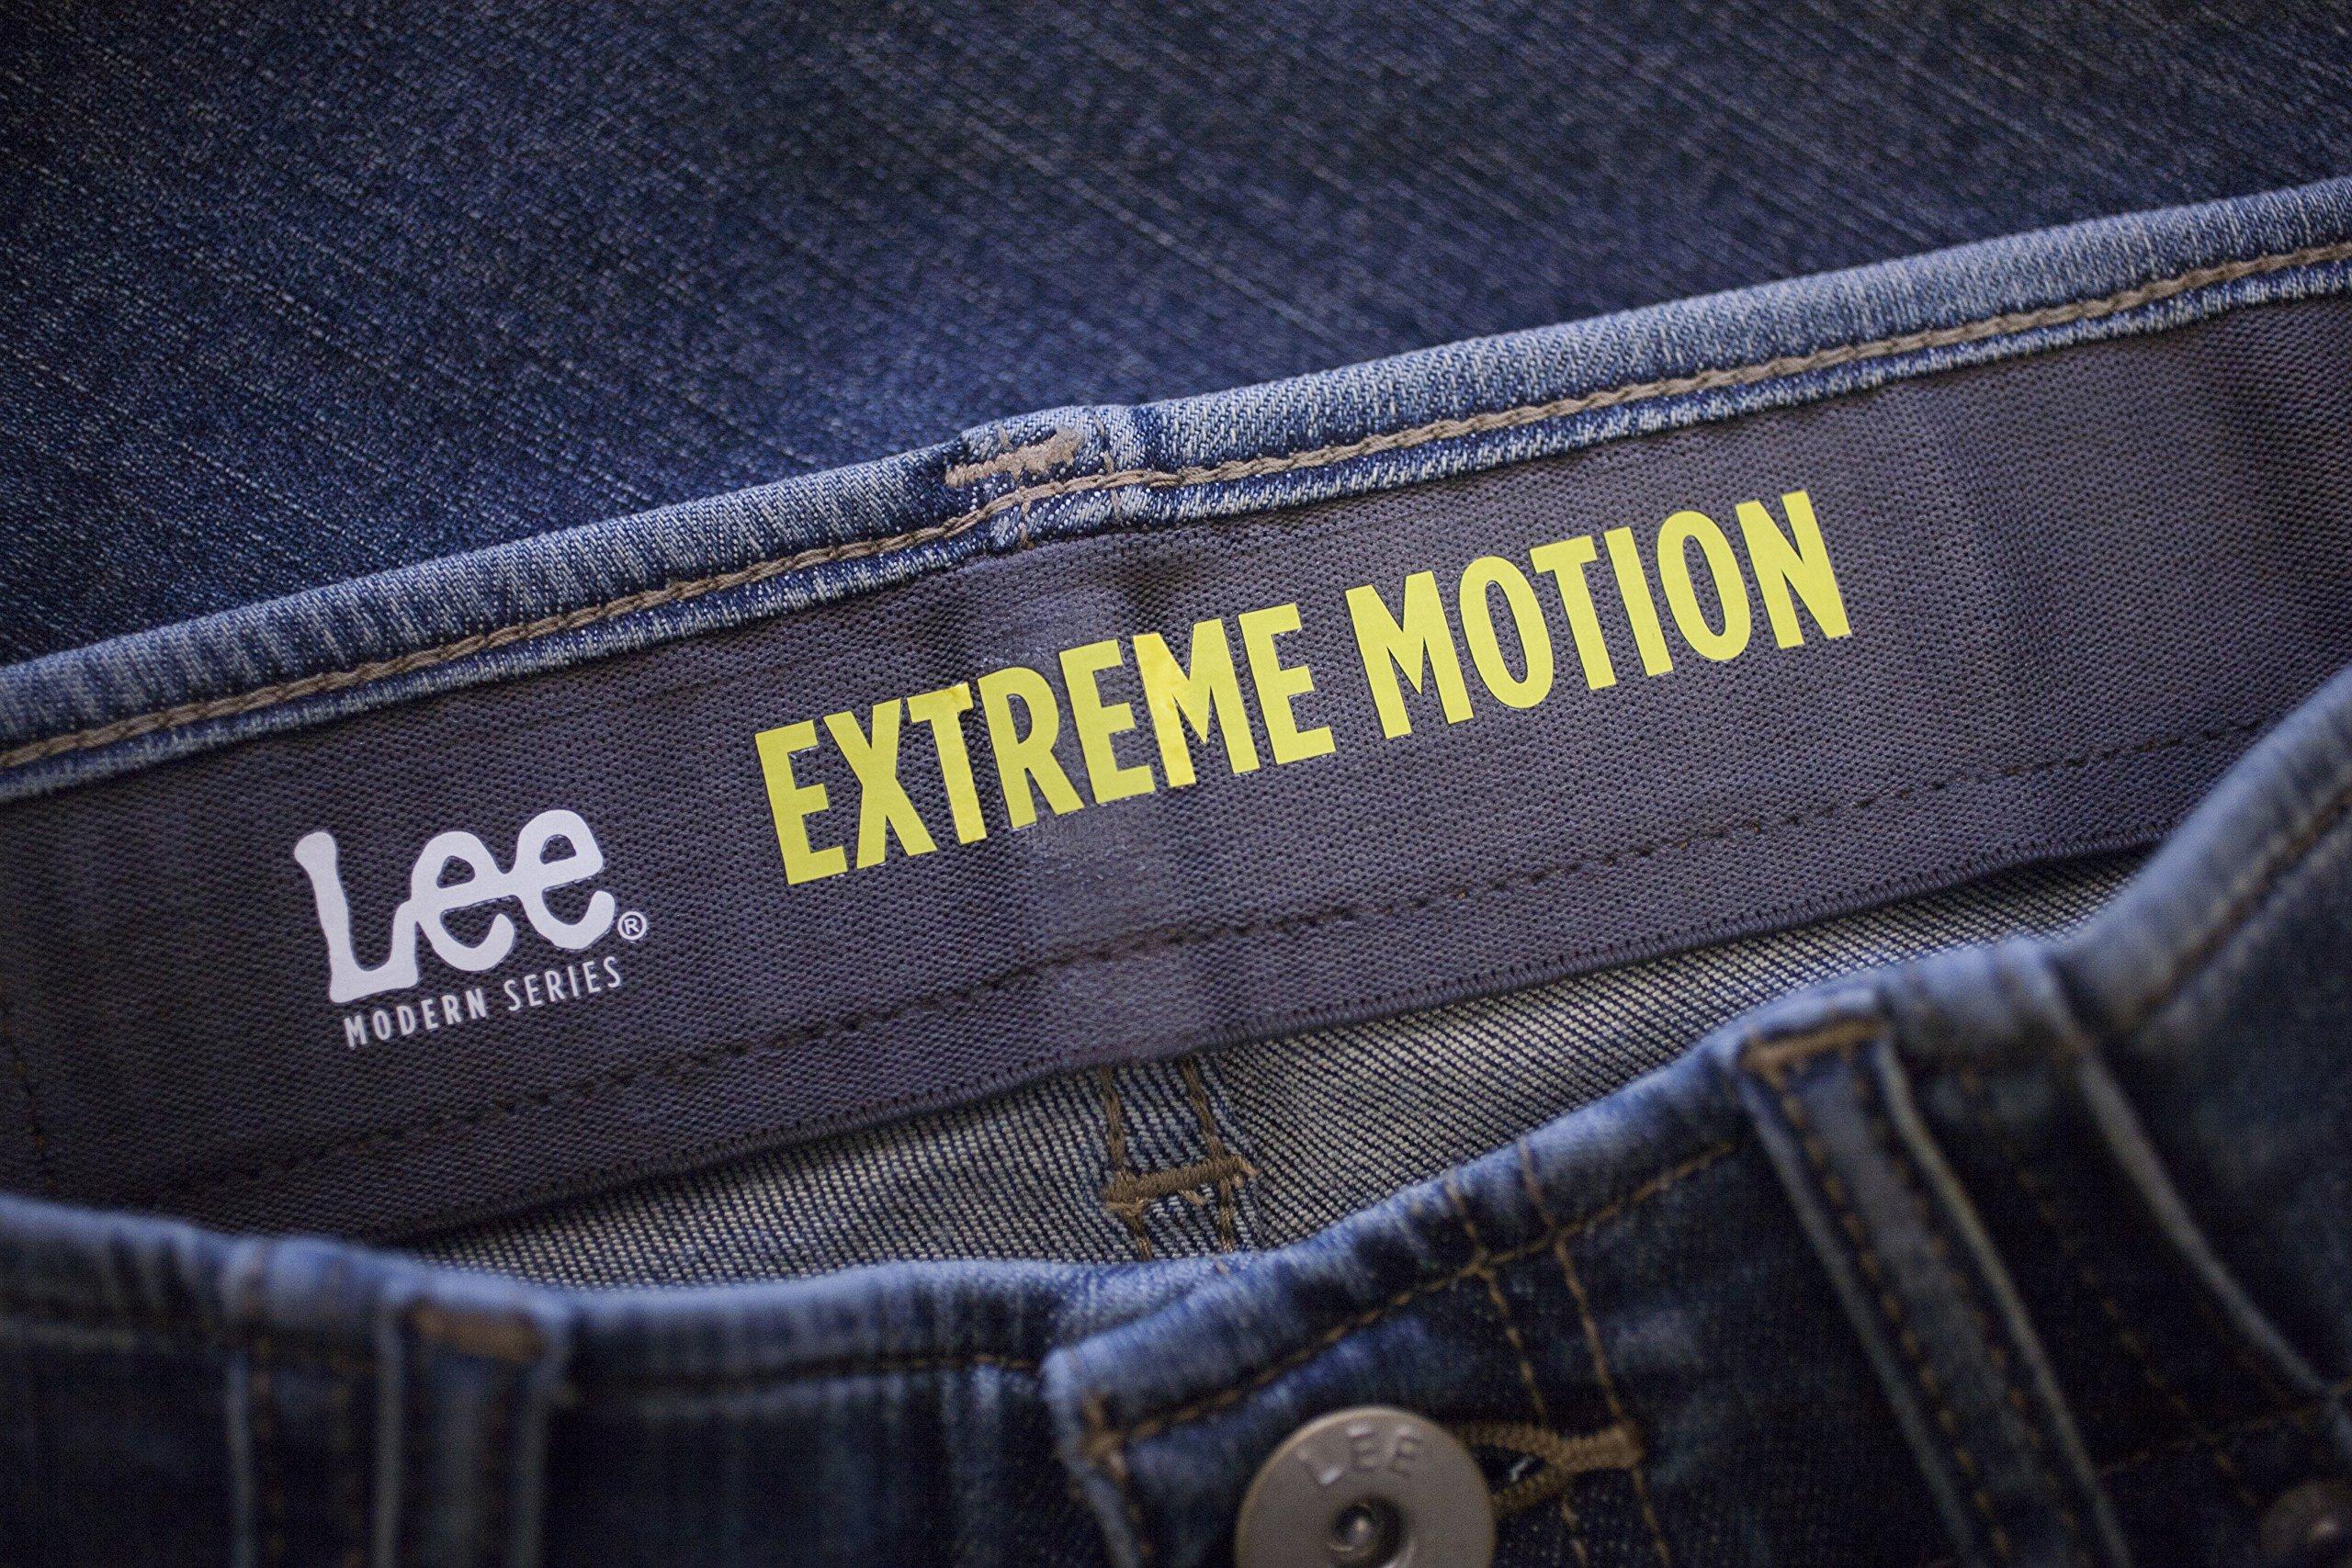 LEE Men's Modern Series Extreme Motion Athletic Jean, Zander, 34W x 30L by LEE (Image #3)